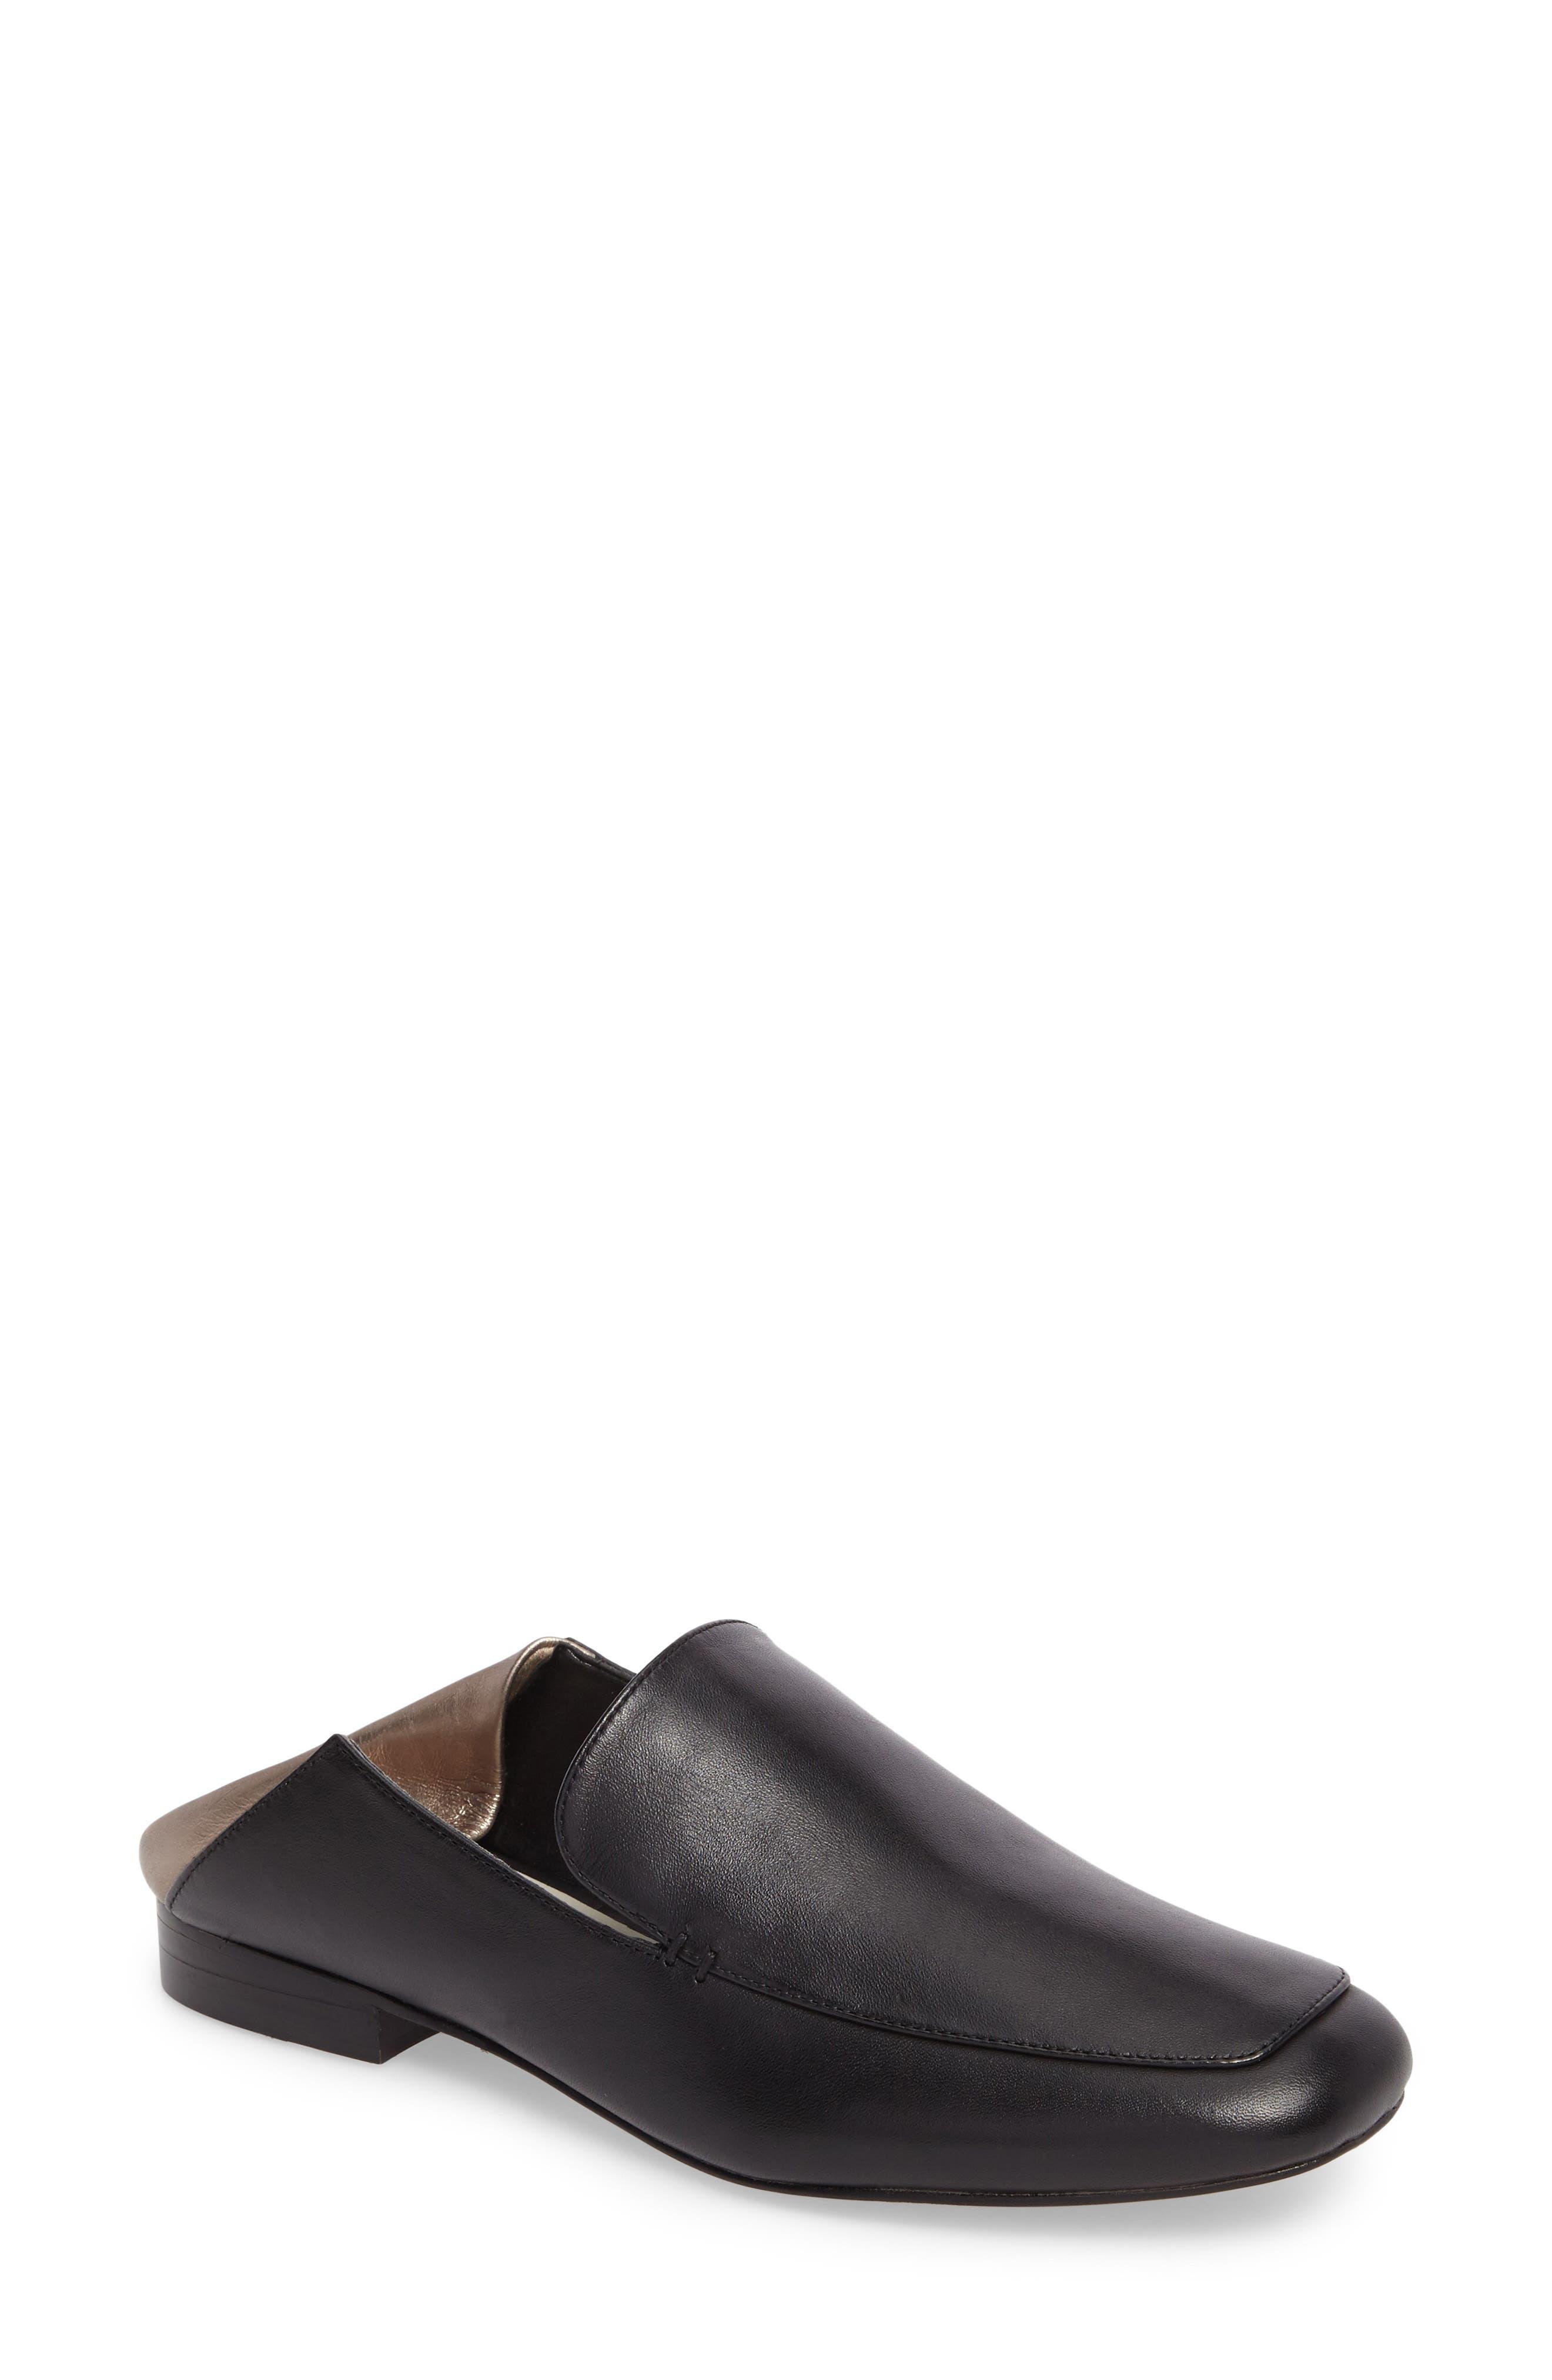 Faun Drop Heel Loafer,                         Main,                         color, 003